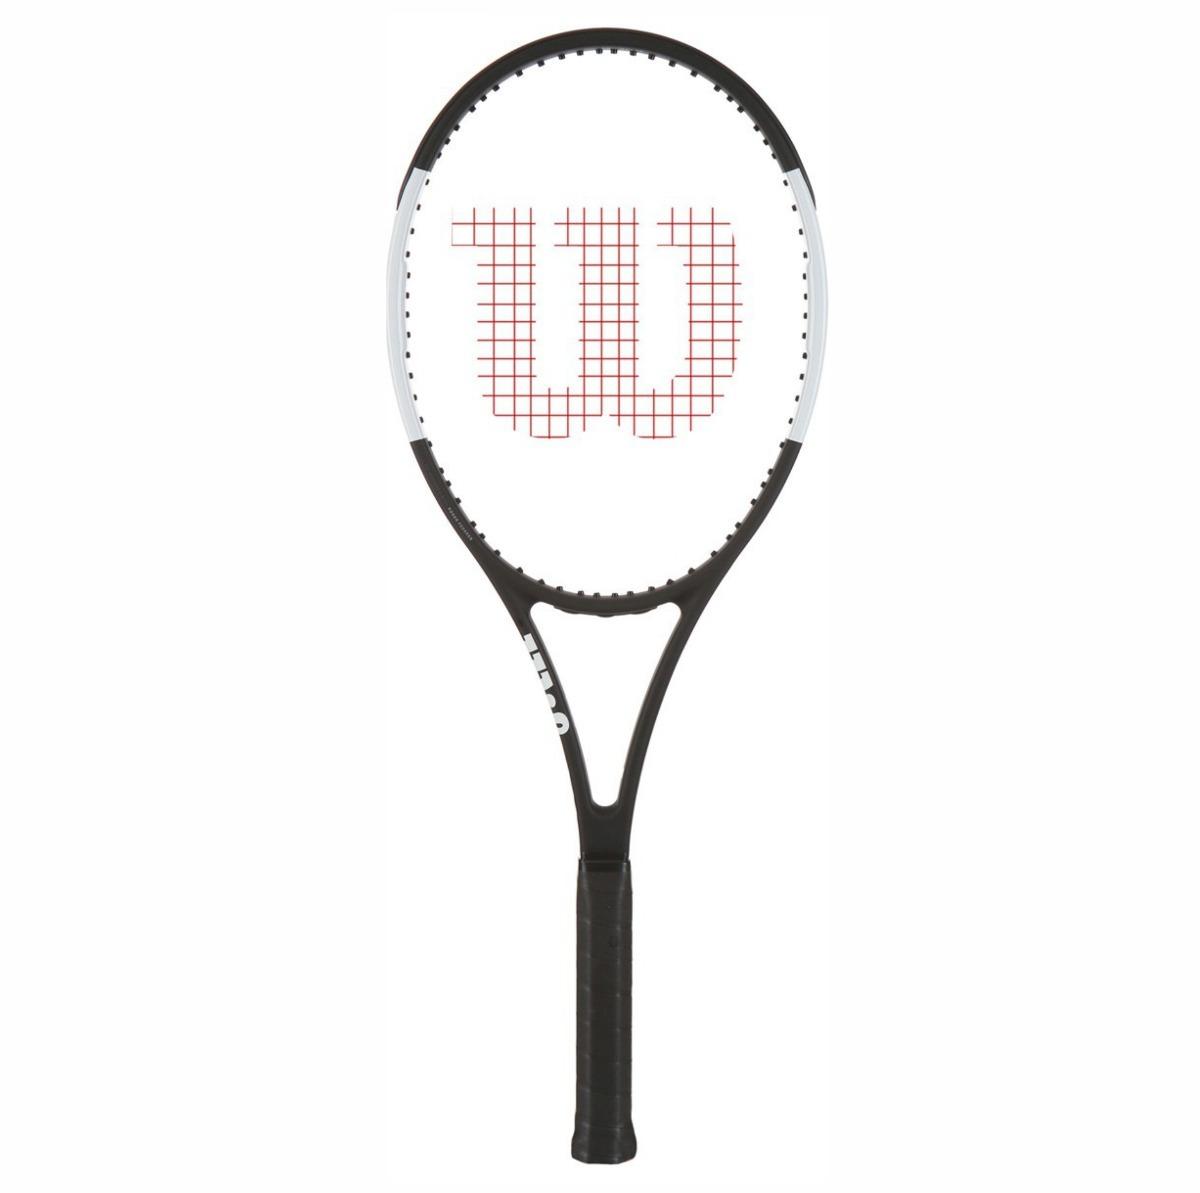 bc9908ad0 raquete de tênis wilson pro staff 97 l - nova. Carregando zoom.